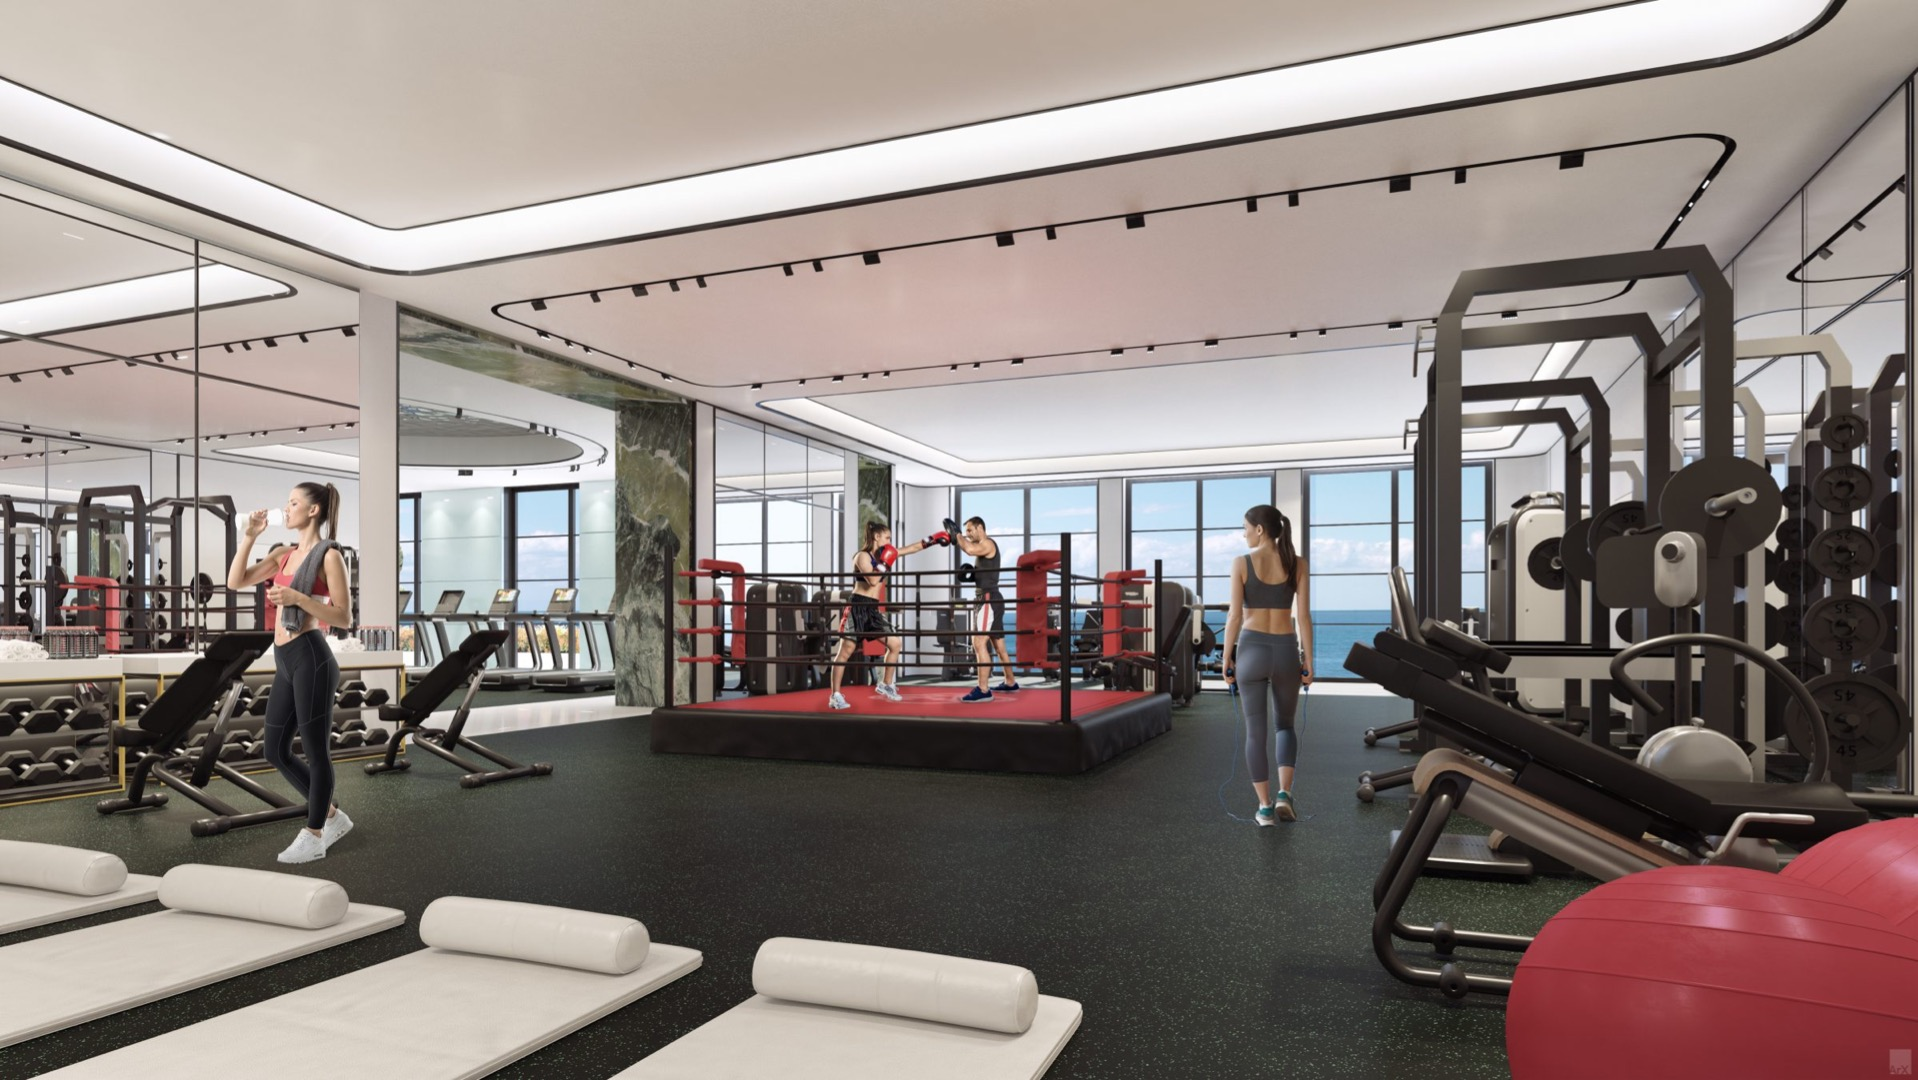 AcquaFit Fitness & Wellness Center image 3